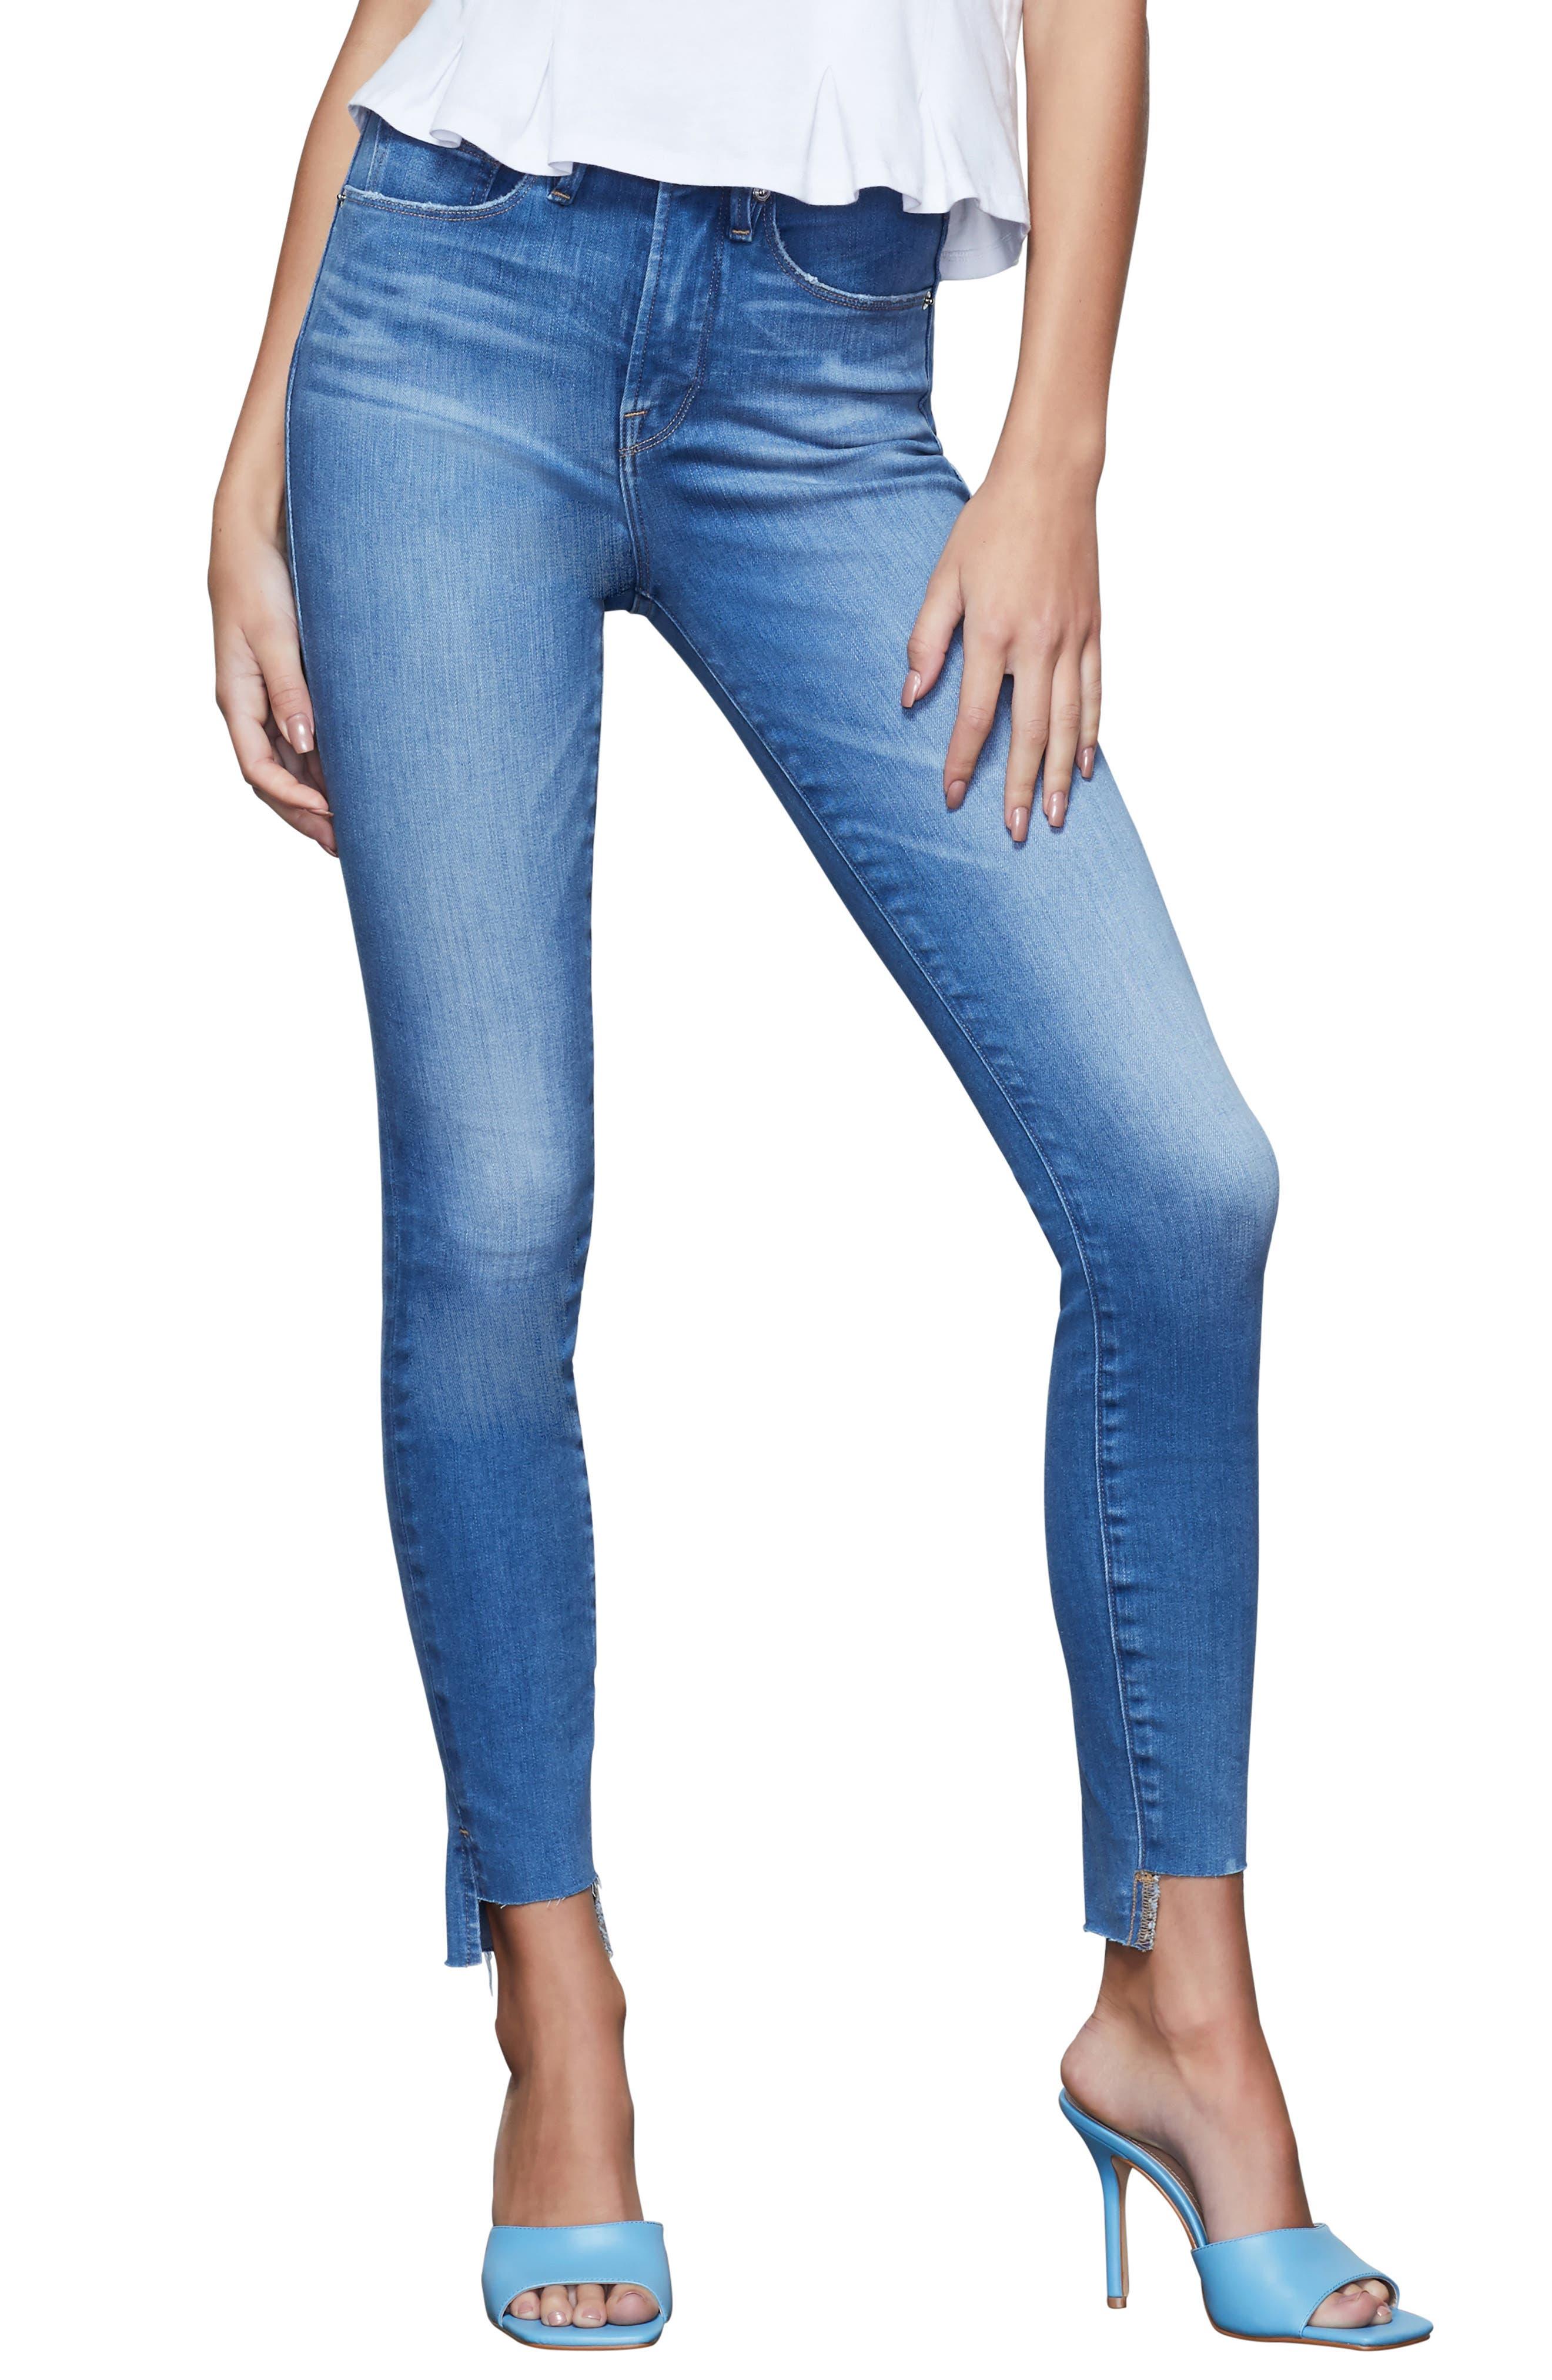 Women's Good American Good Waist High Waist Step Hem Skinny Jeans